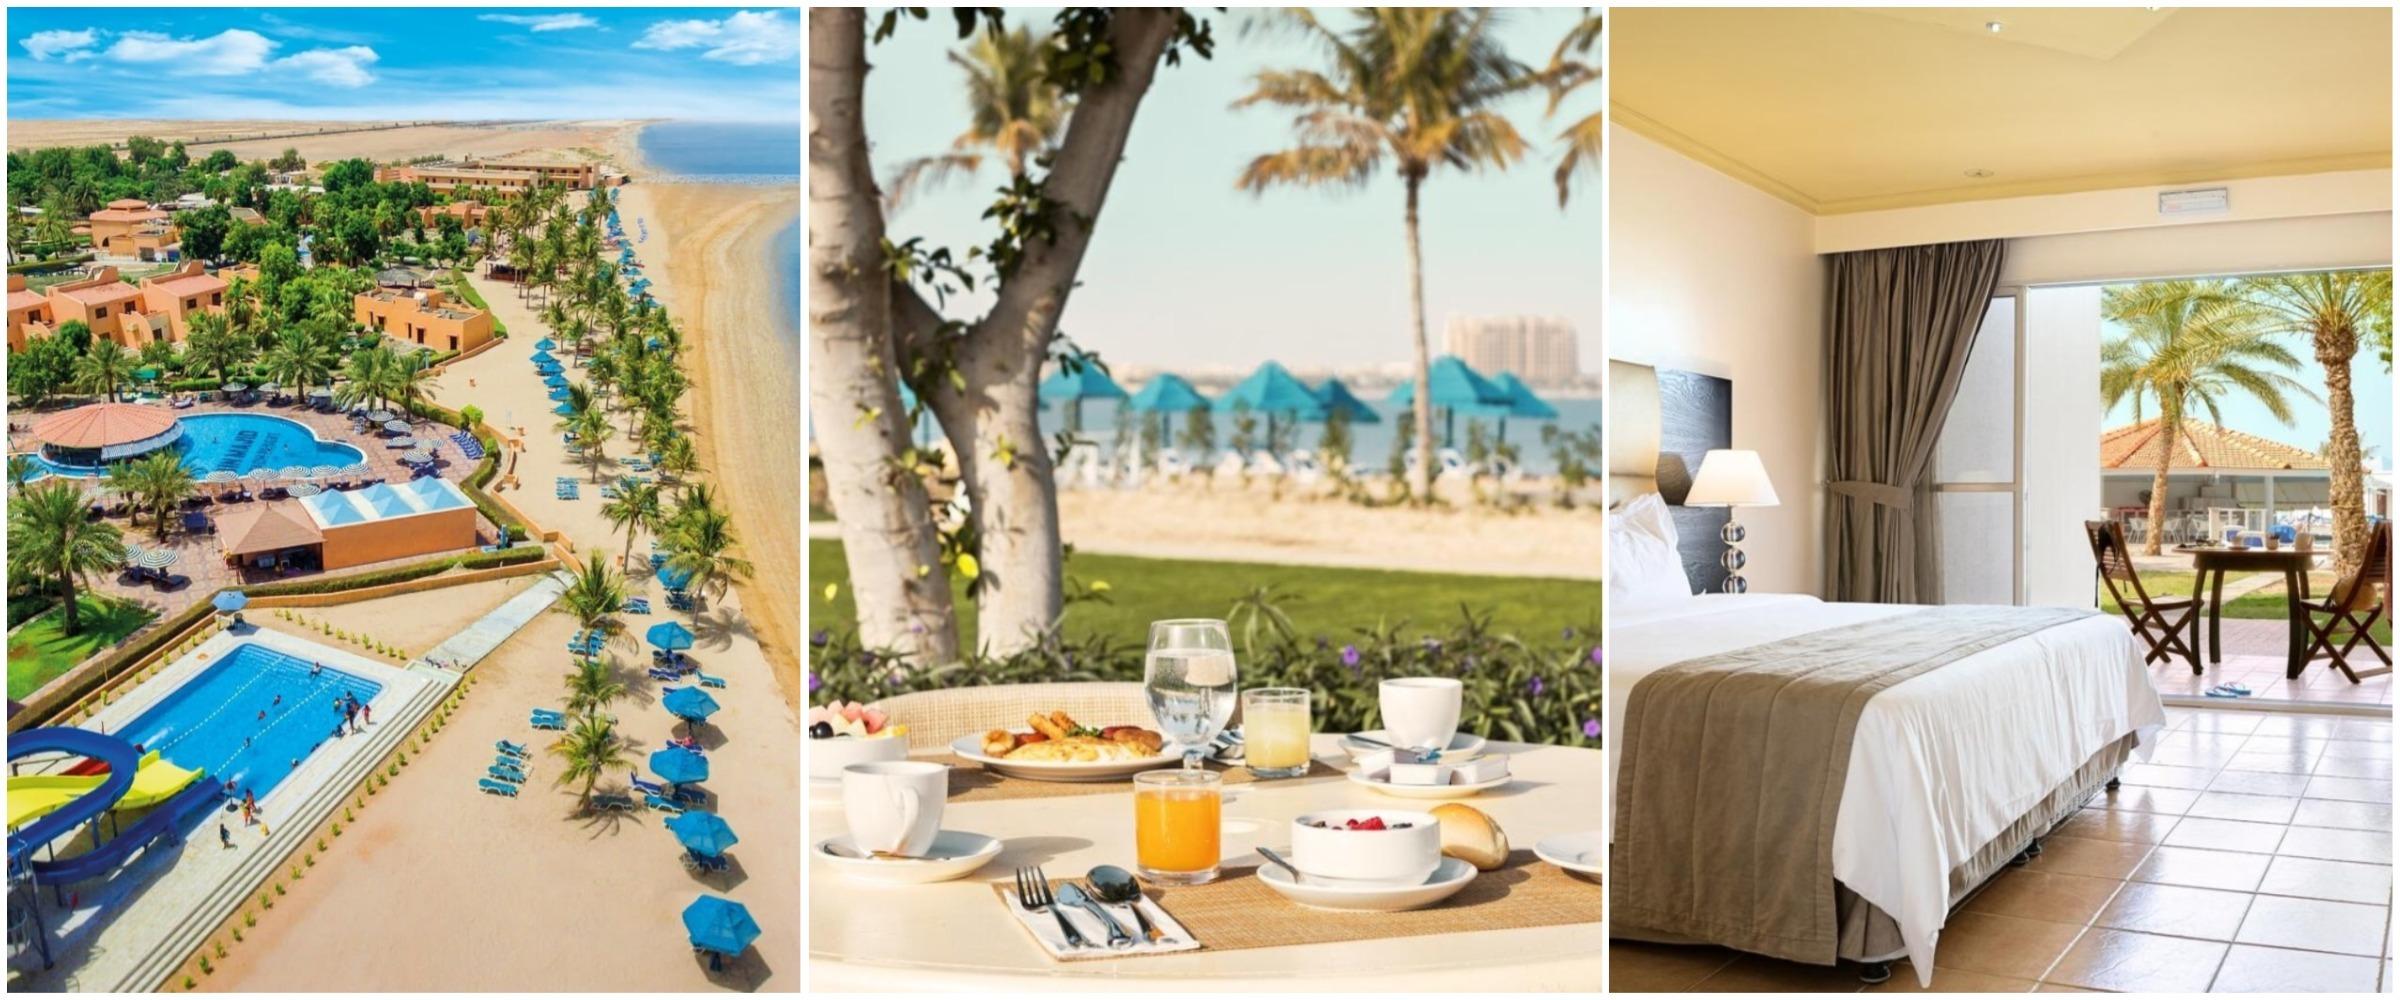 BM Beach Resort 4*